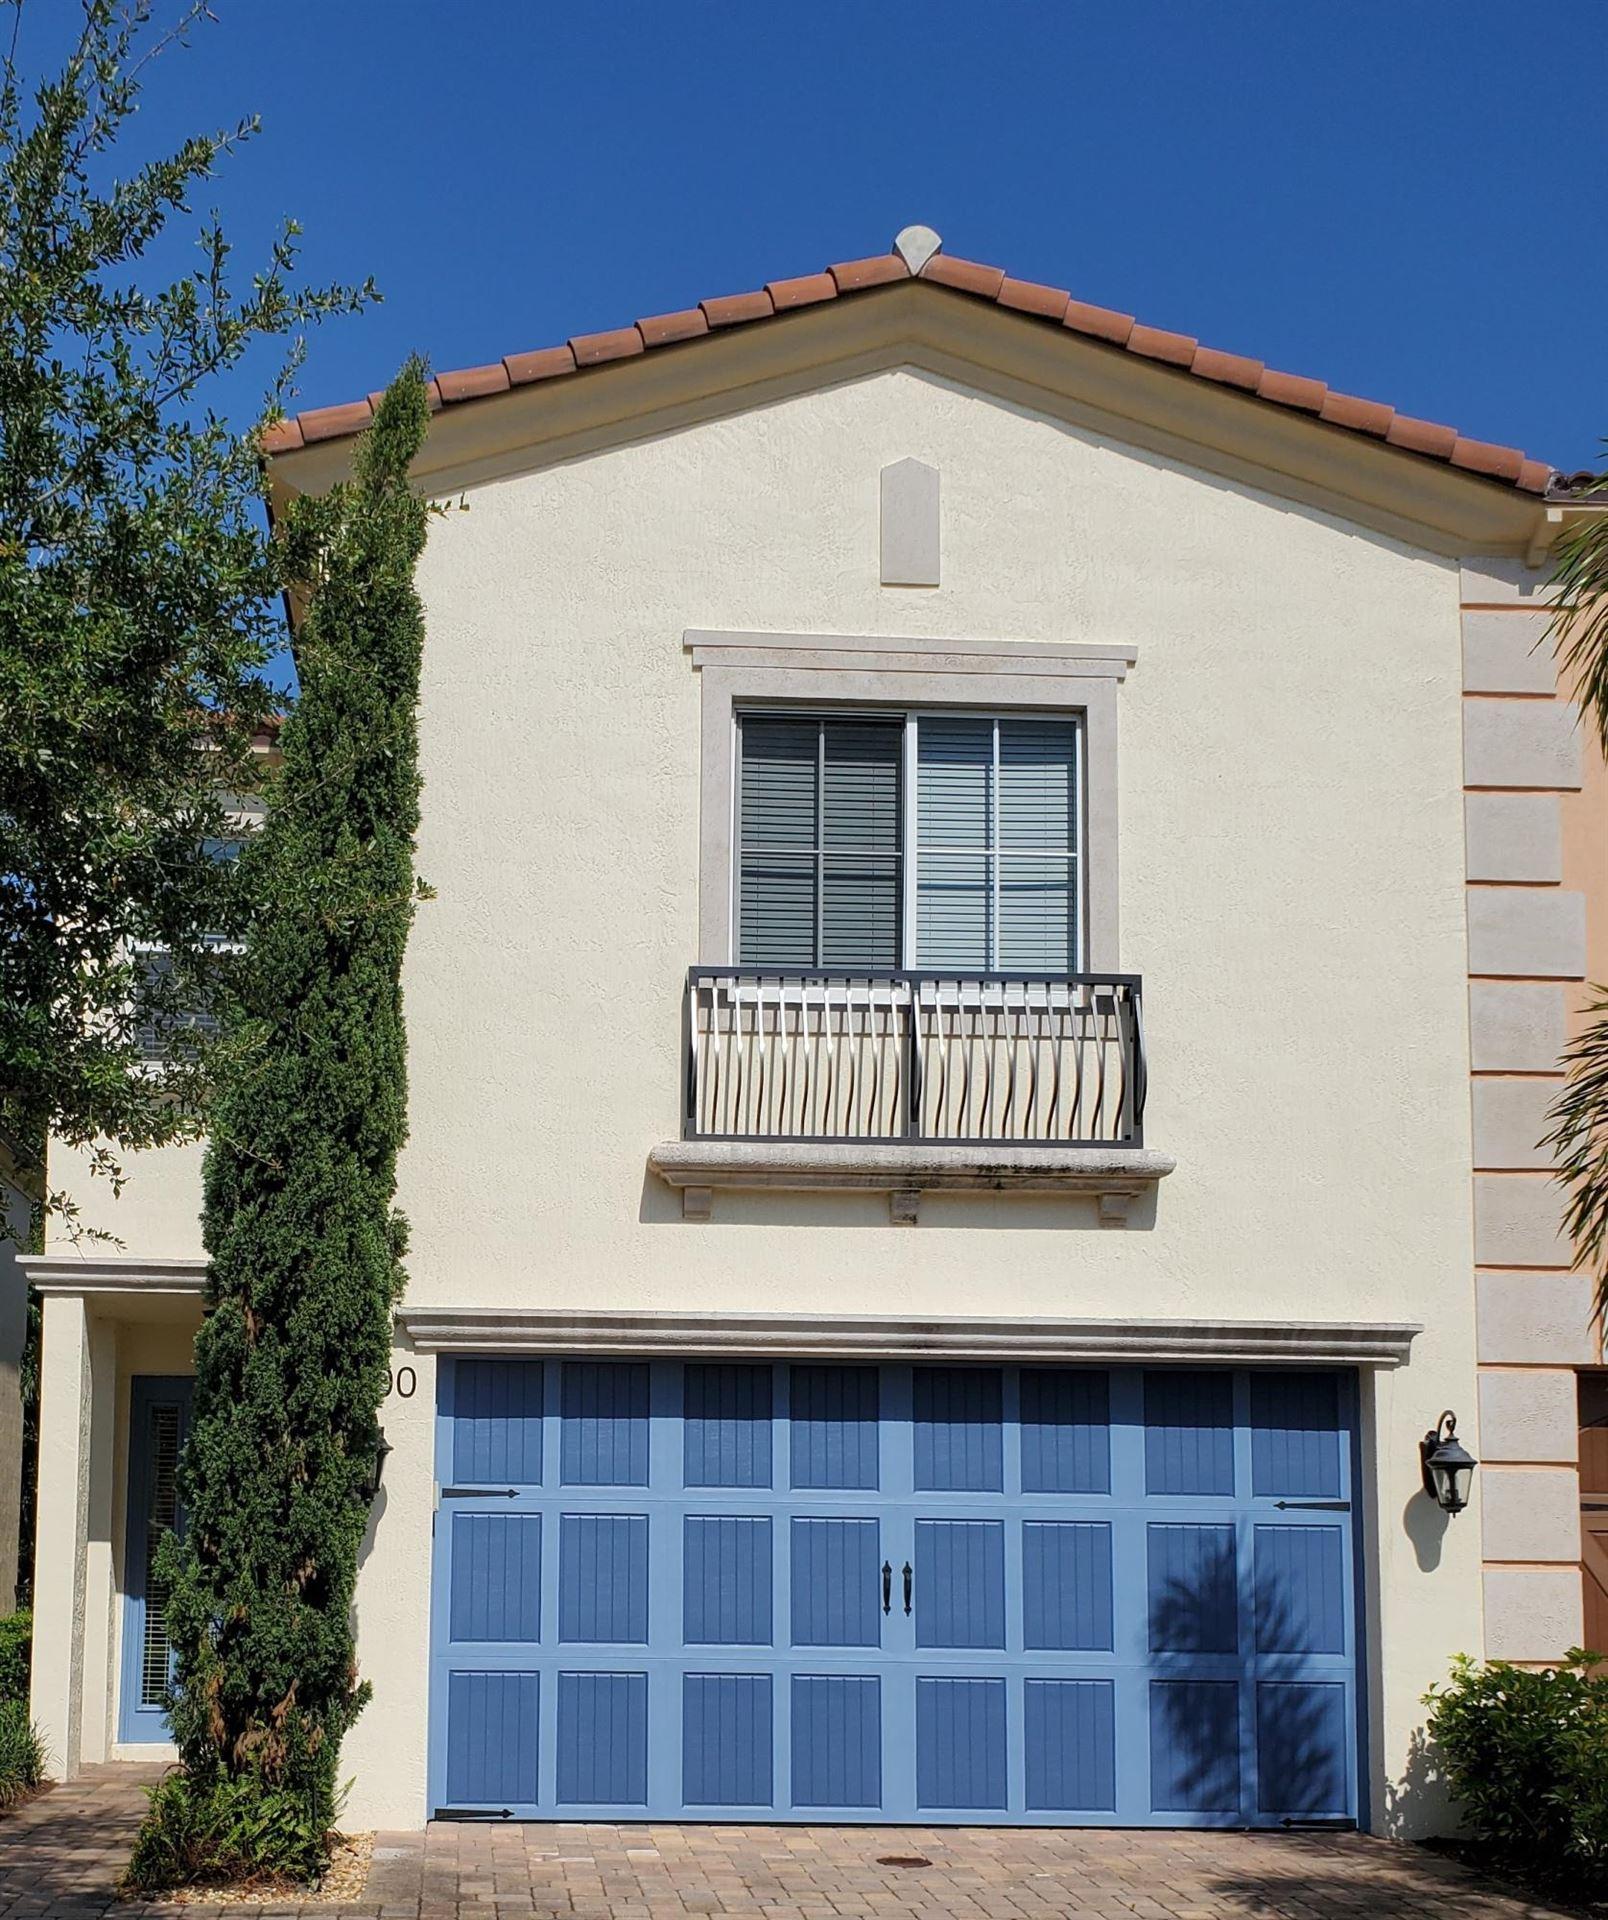 2100 Sabal Tree Court, West Palm Beach, FL 33411 - MLS#: RX-10714455